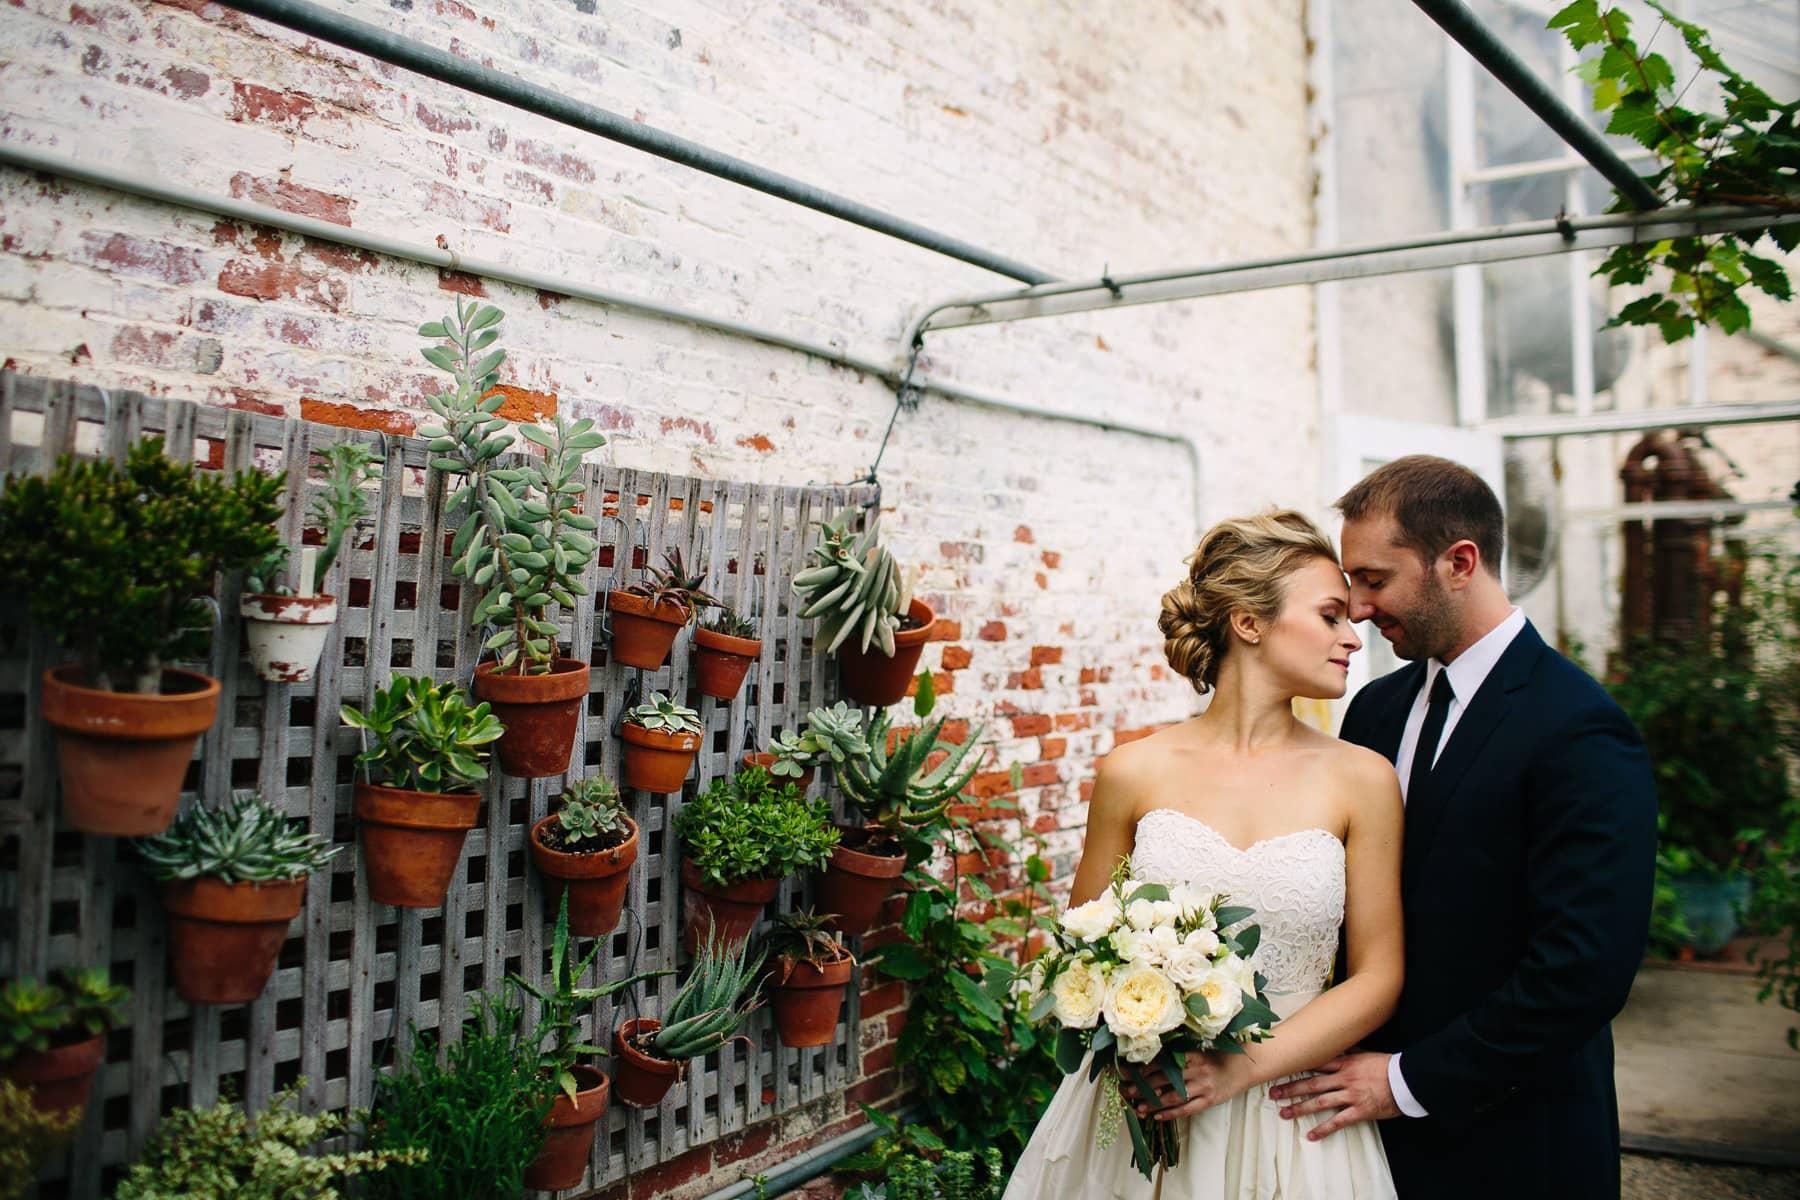 A Year of Weddings 2016  Boston Wedding Photographer  Kelly Benvenuto  Wedding Photography